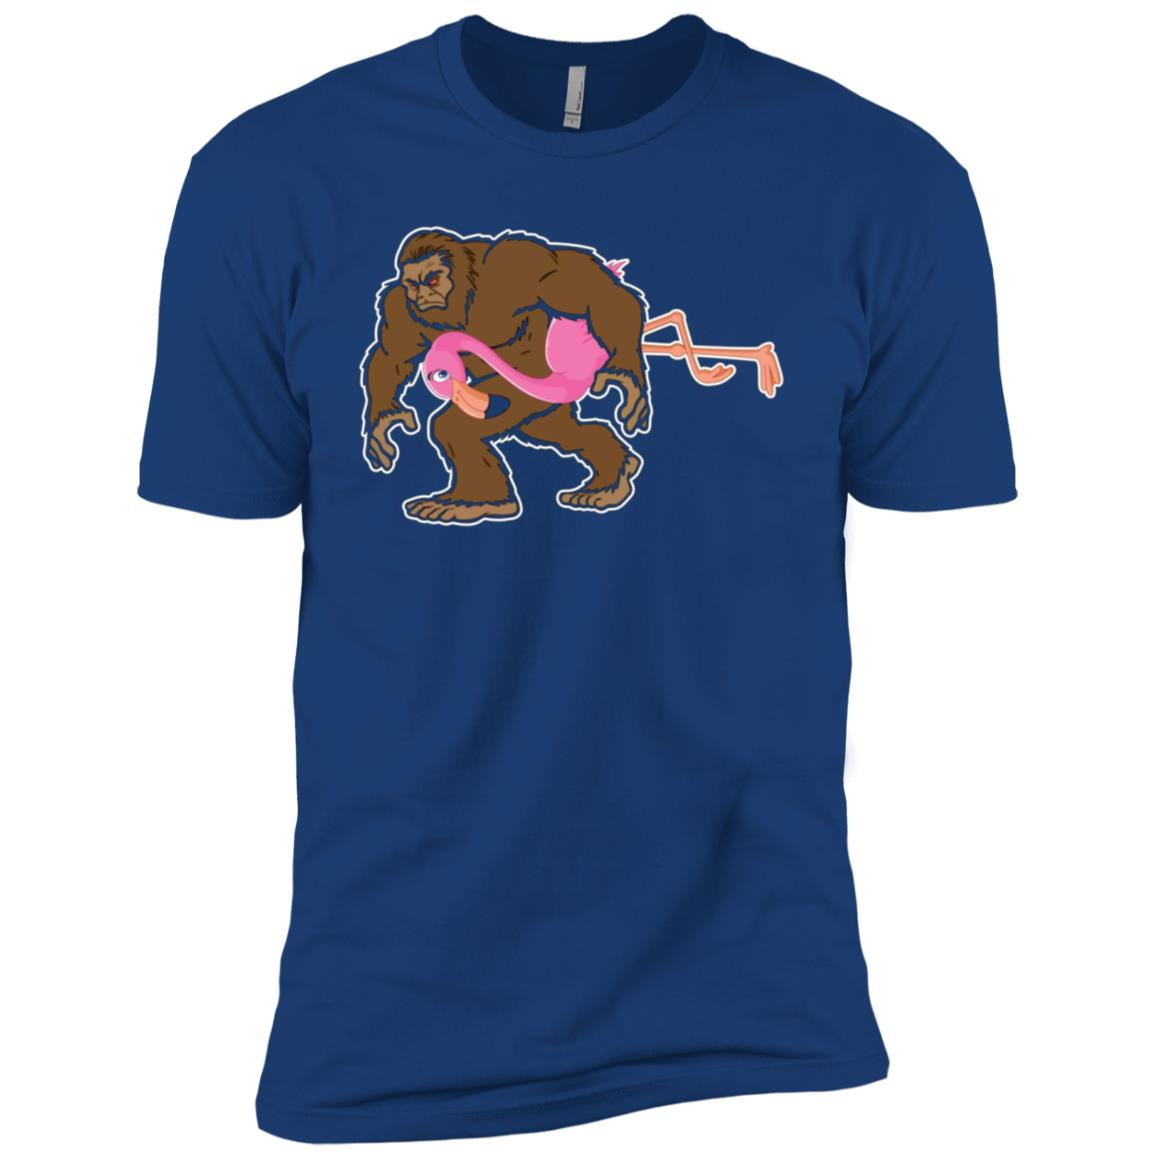 Funny Bigfoot Carrying a Flamingo d Men Short Sleeve T-Shirt